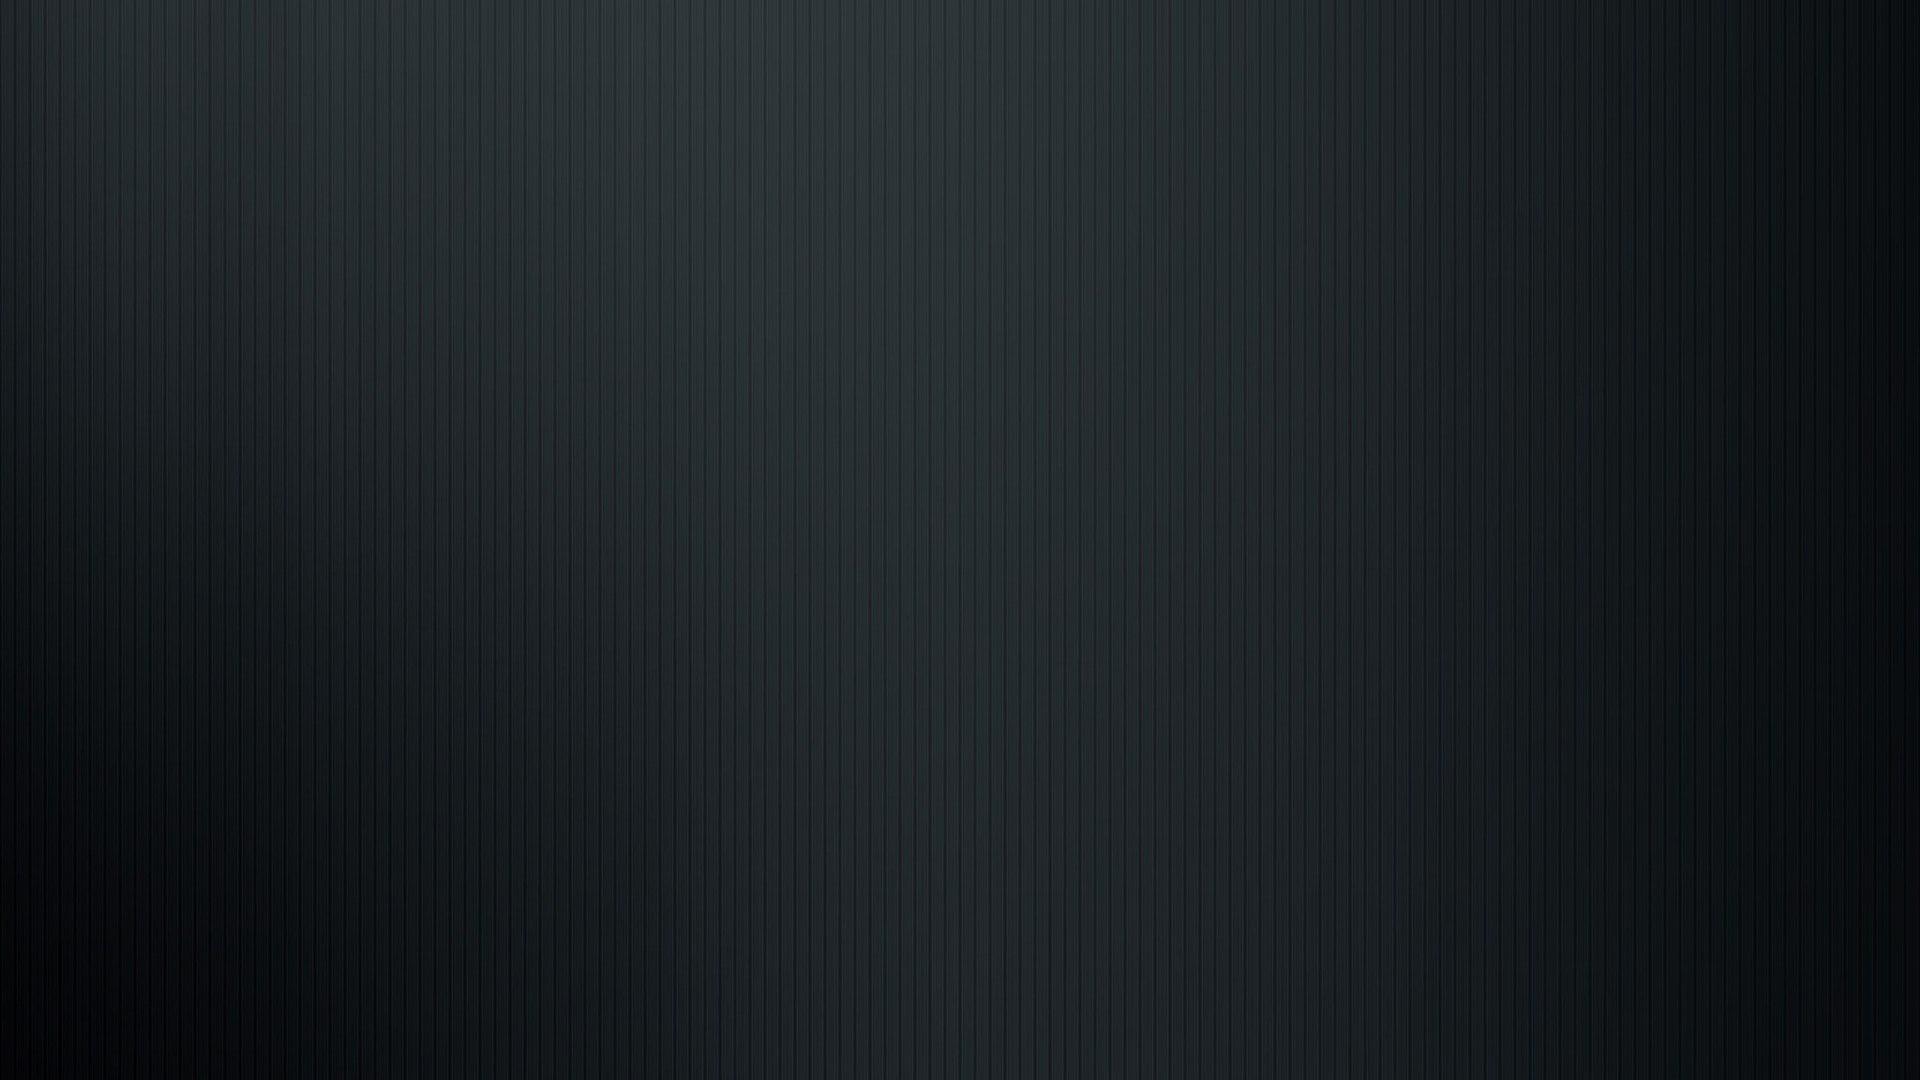 Dual screen wallpaper 3840x1080 HQ WALLPAPER   25997 1920x1080